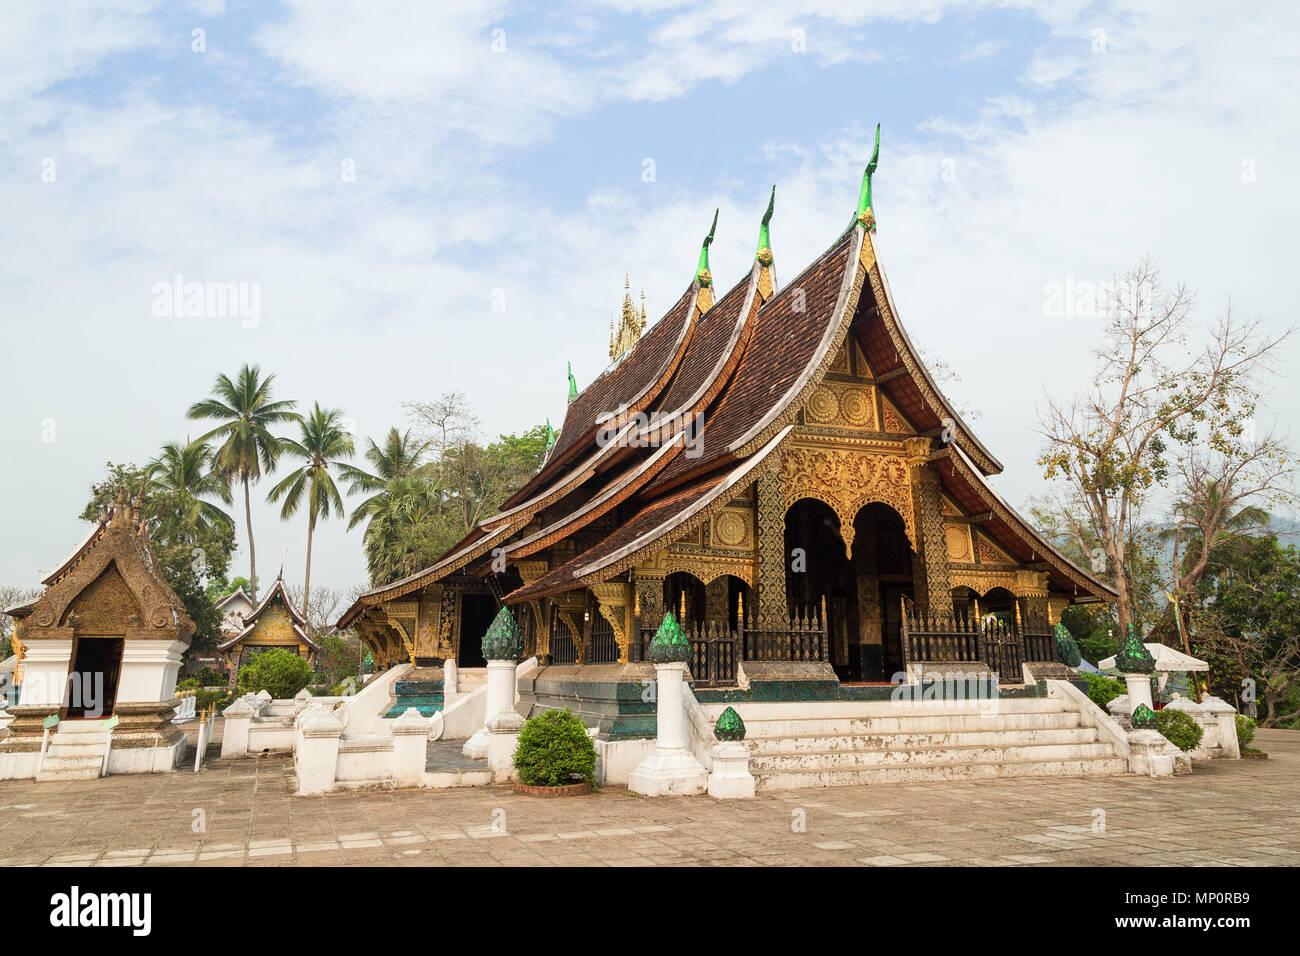 "Vista il buddista di Wat Xieng Thong tempio (""Tempio della città d'oro"") a Luang Prabang, Laos. Immagini Stock"